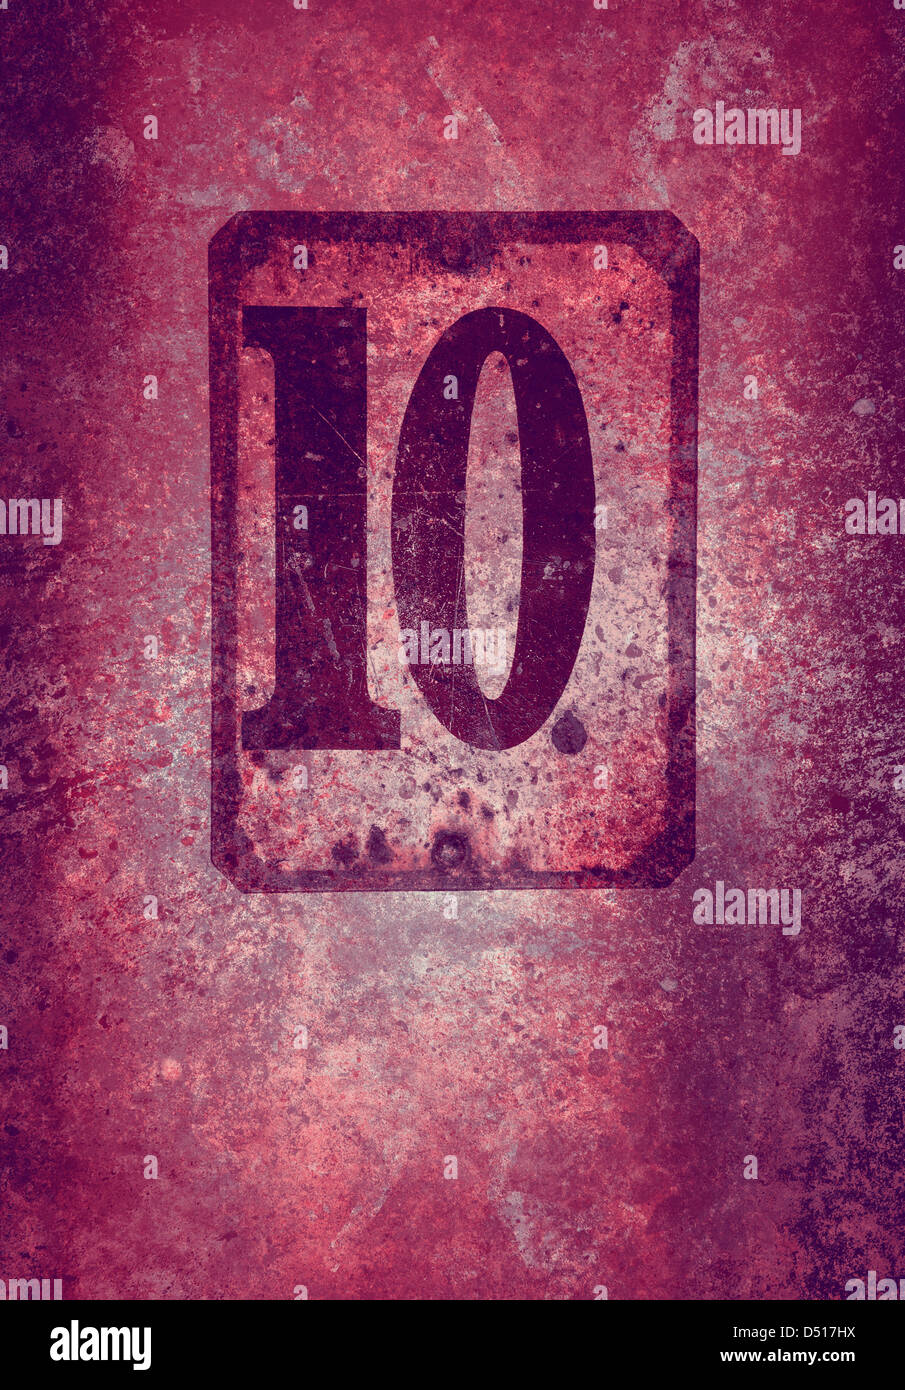 grunge 10 Photo Stock